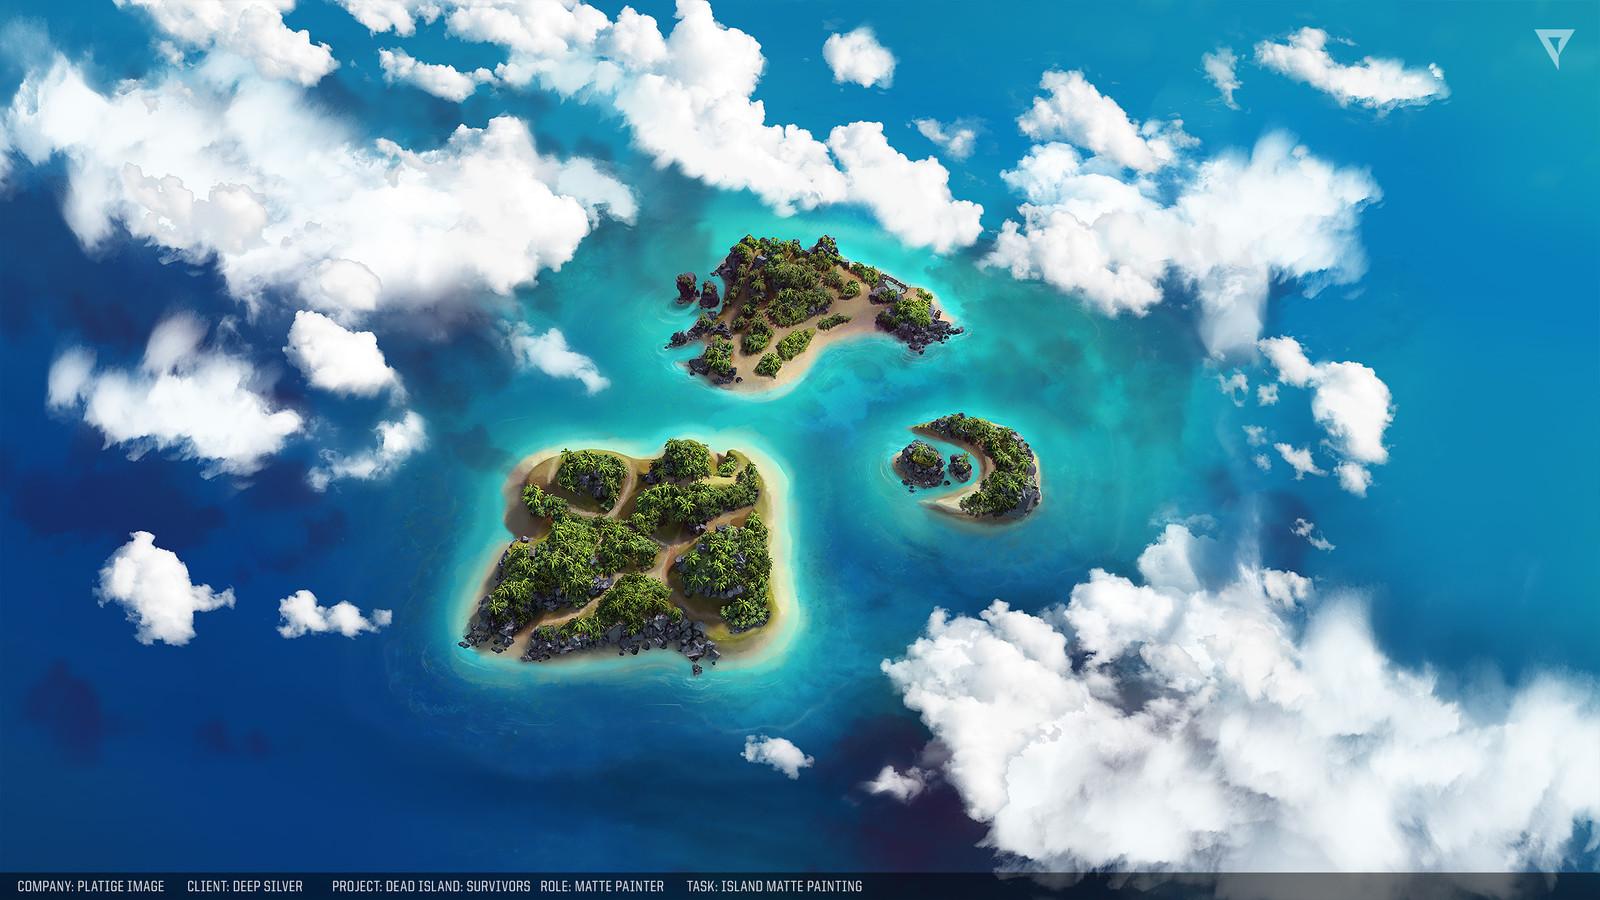 Island mattepainting